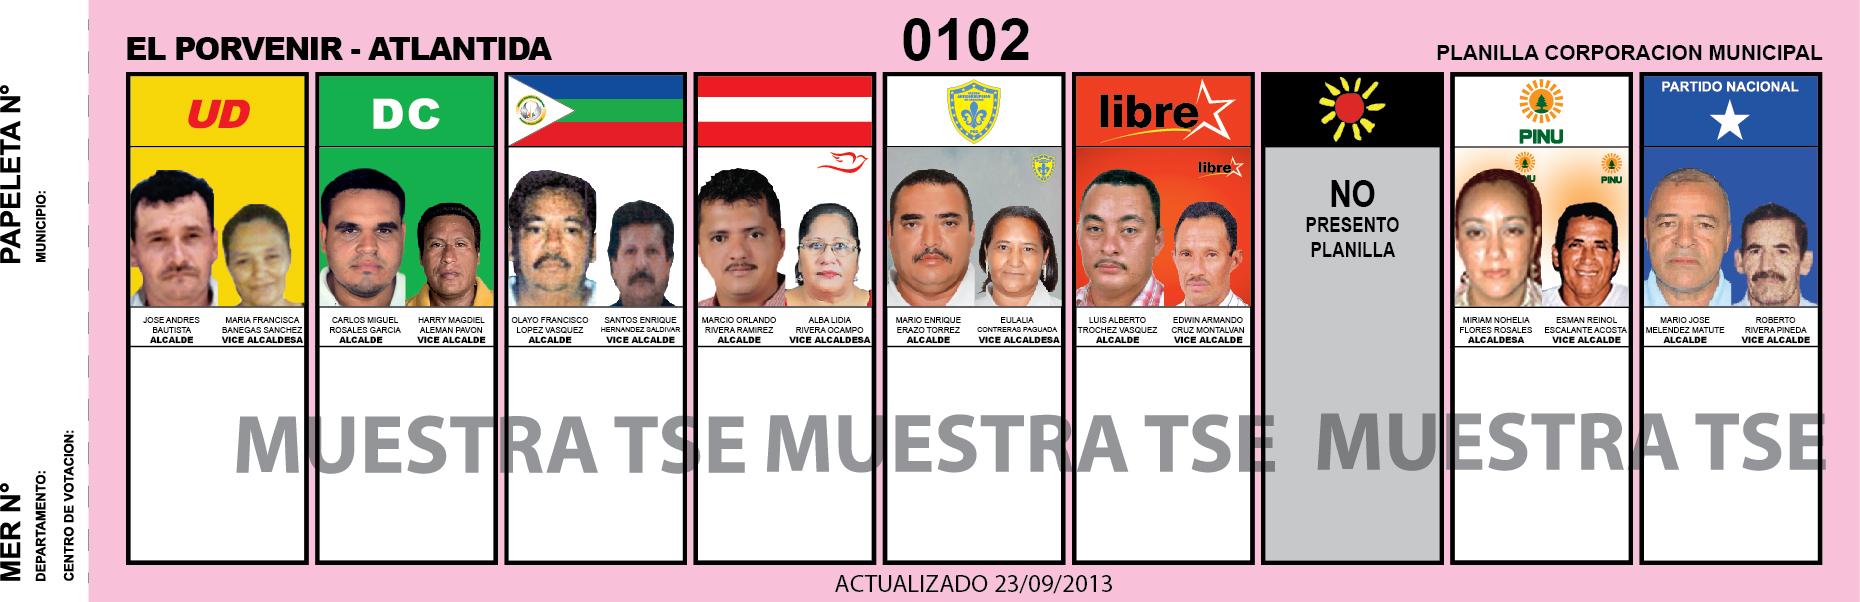 CANDIDATOS 2013 MUNICIPIO EL PORVENIR - ATLANTIDA - HONDURAS